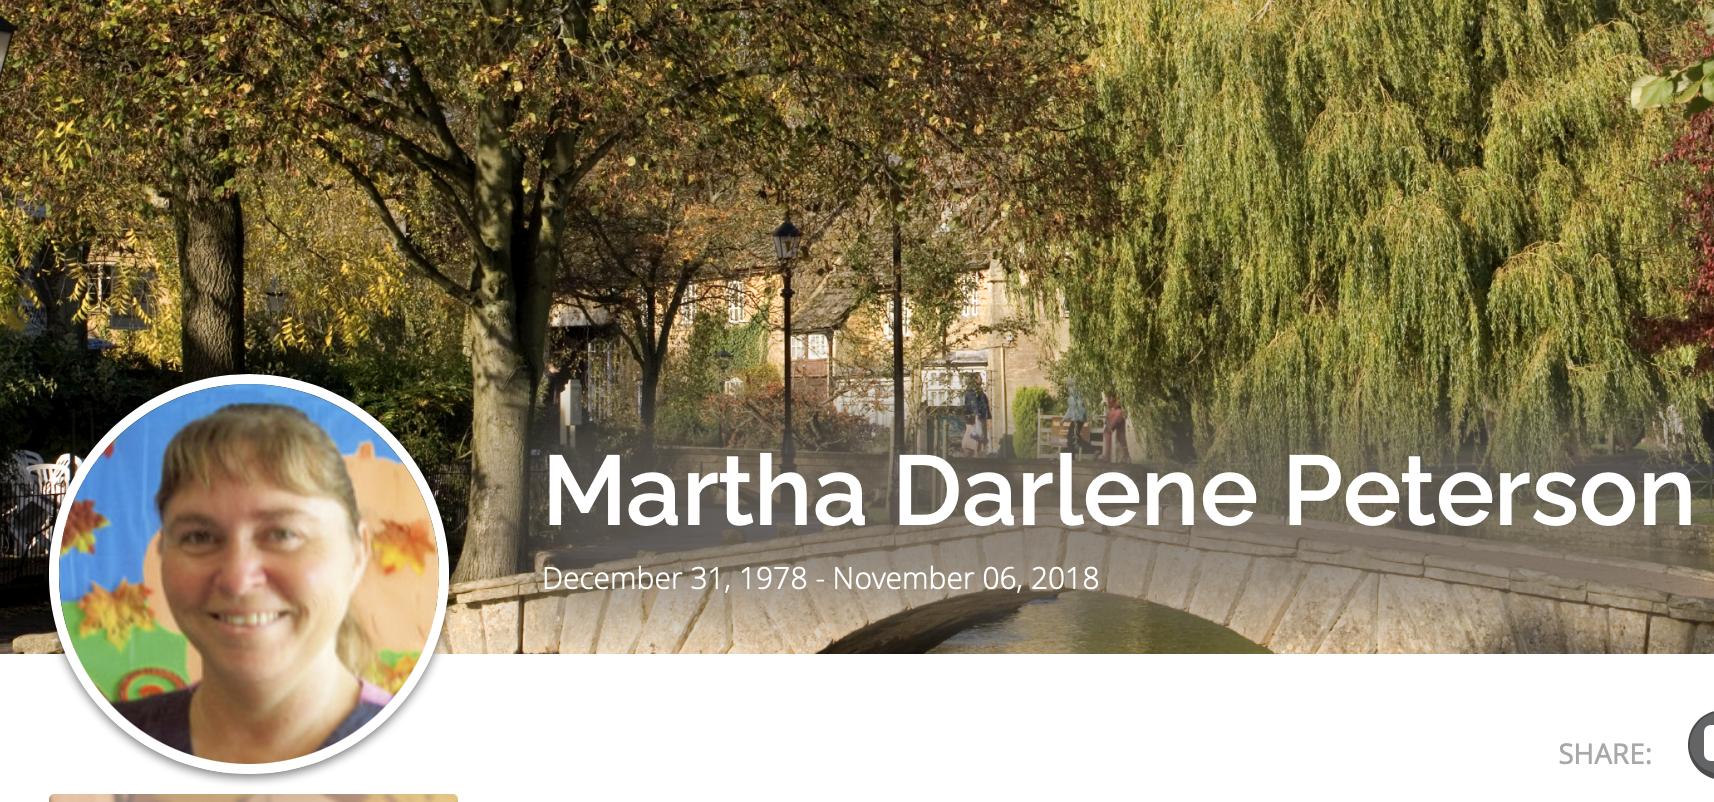 Image of Martha Darlene Peterson from obituary